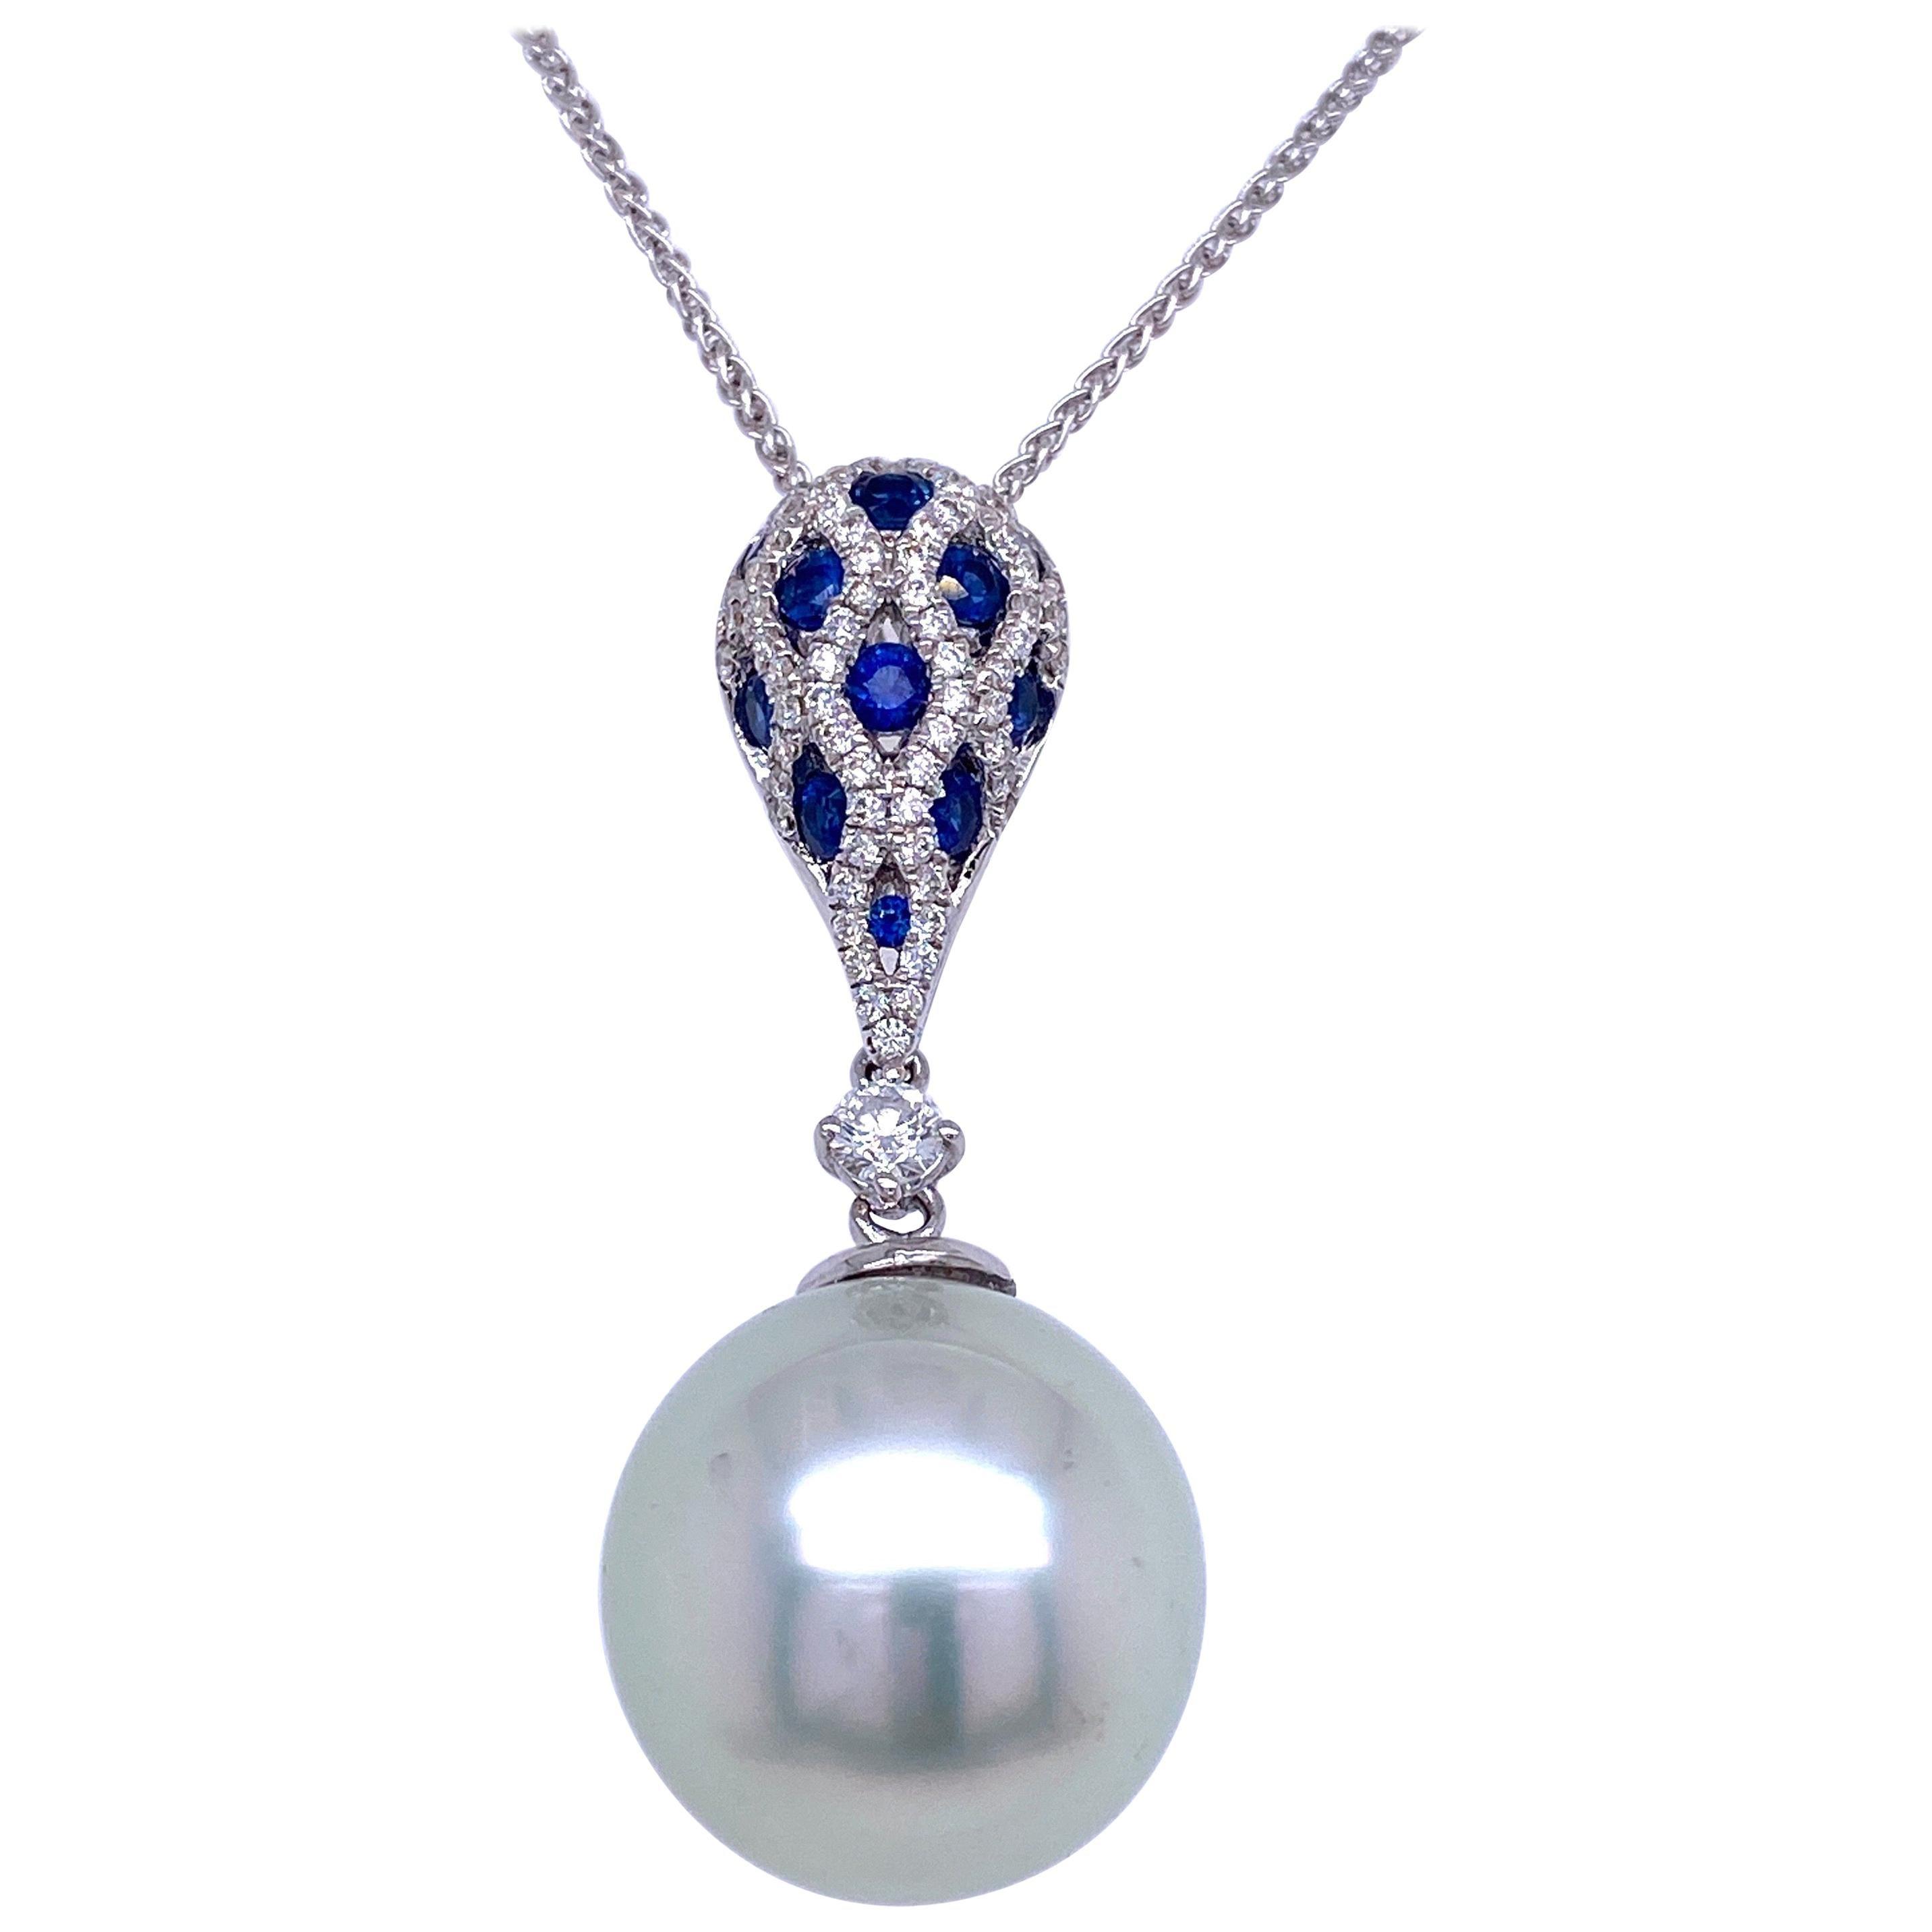 South Sea Pearl Sapphire Diamond Pendant Necklace 0.64 Carat 18 Karat White Gold